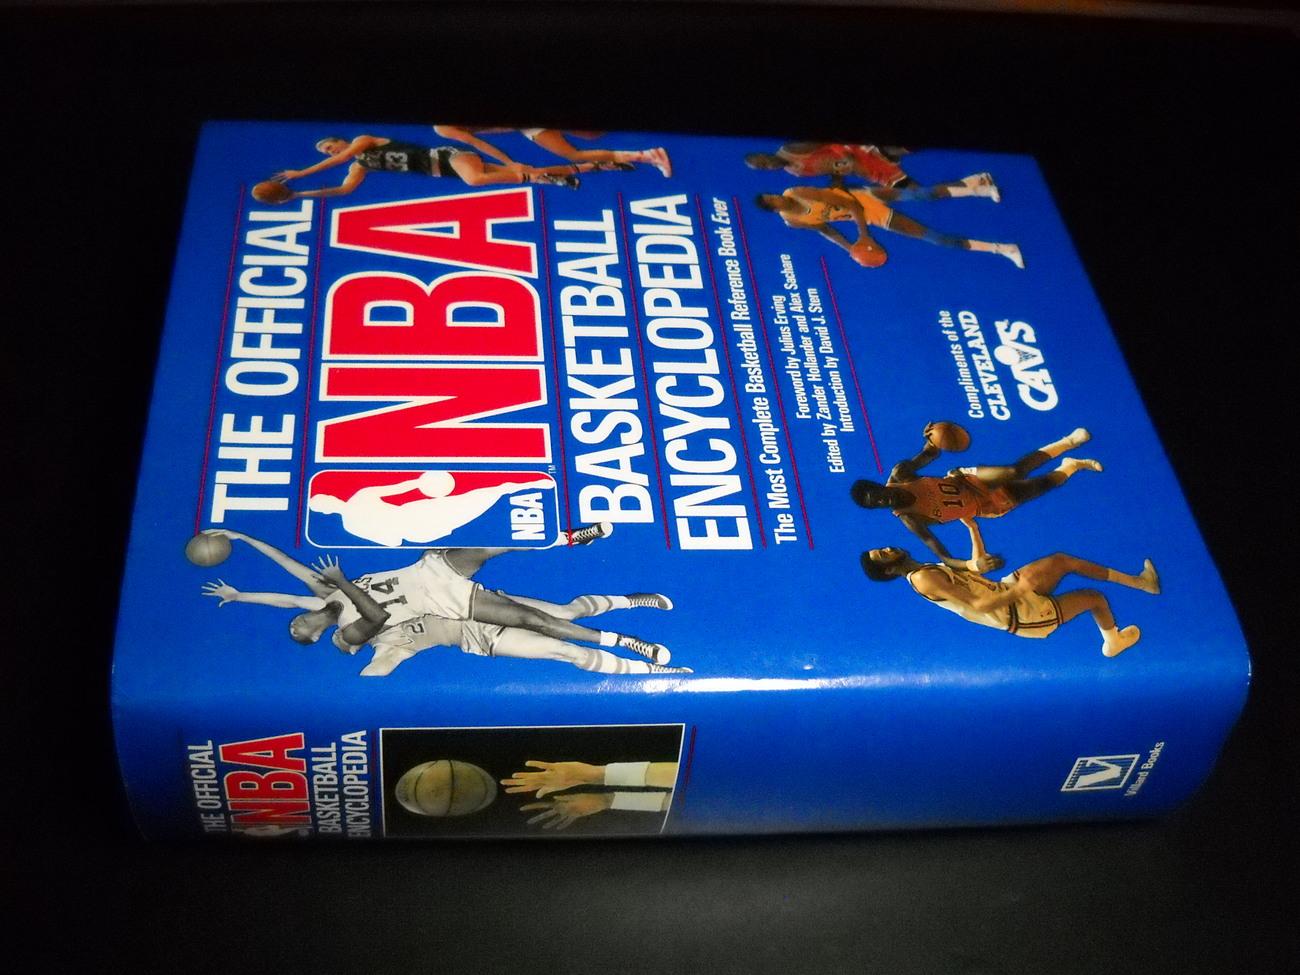 Book the official nba basketball encyclopedia 1989 villard books compliments cleveland cavs hcdj 02